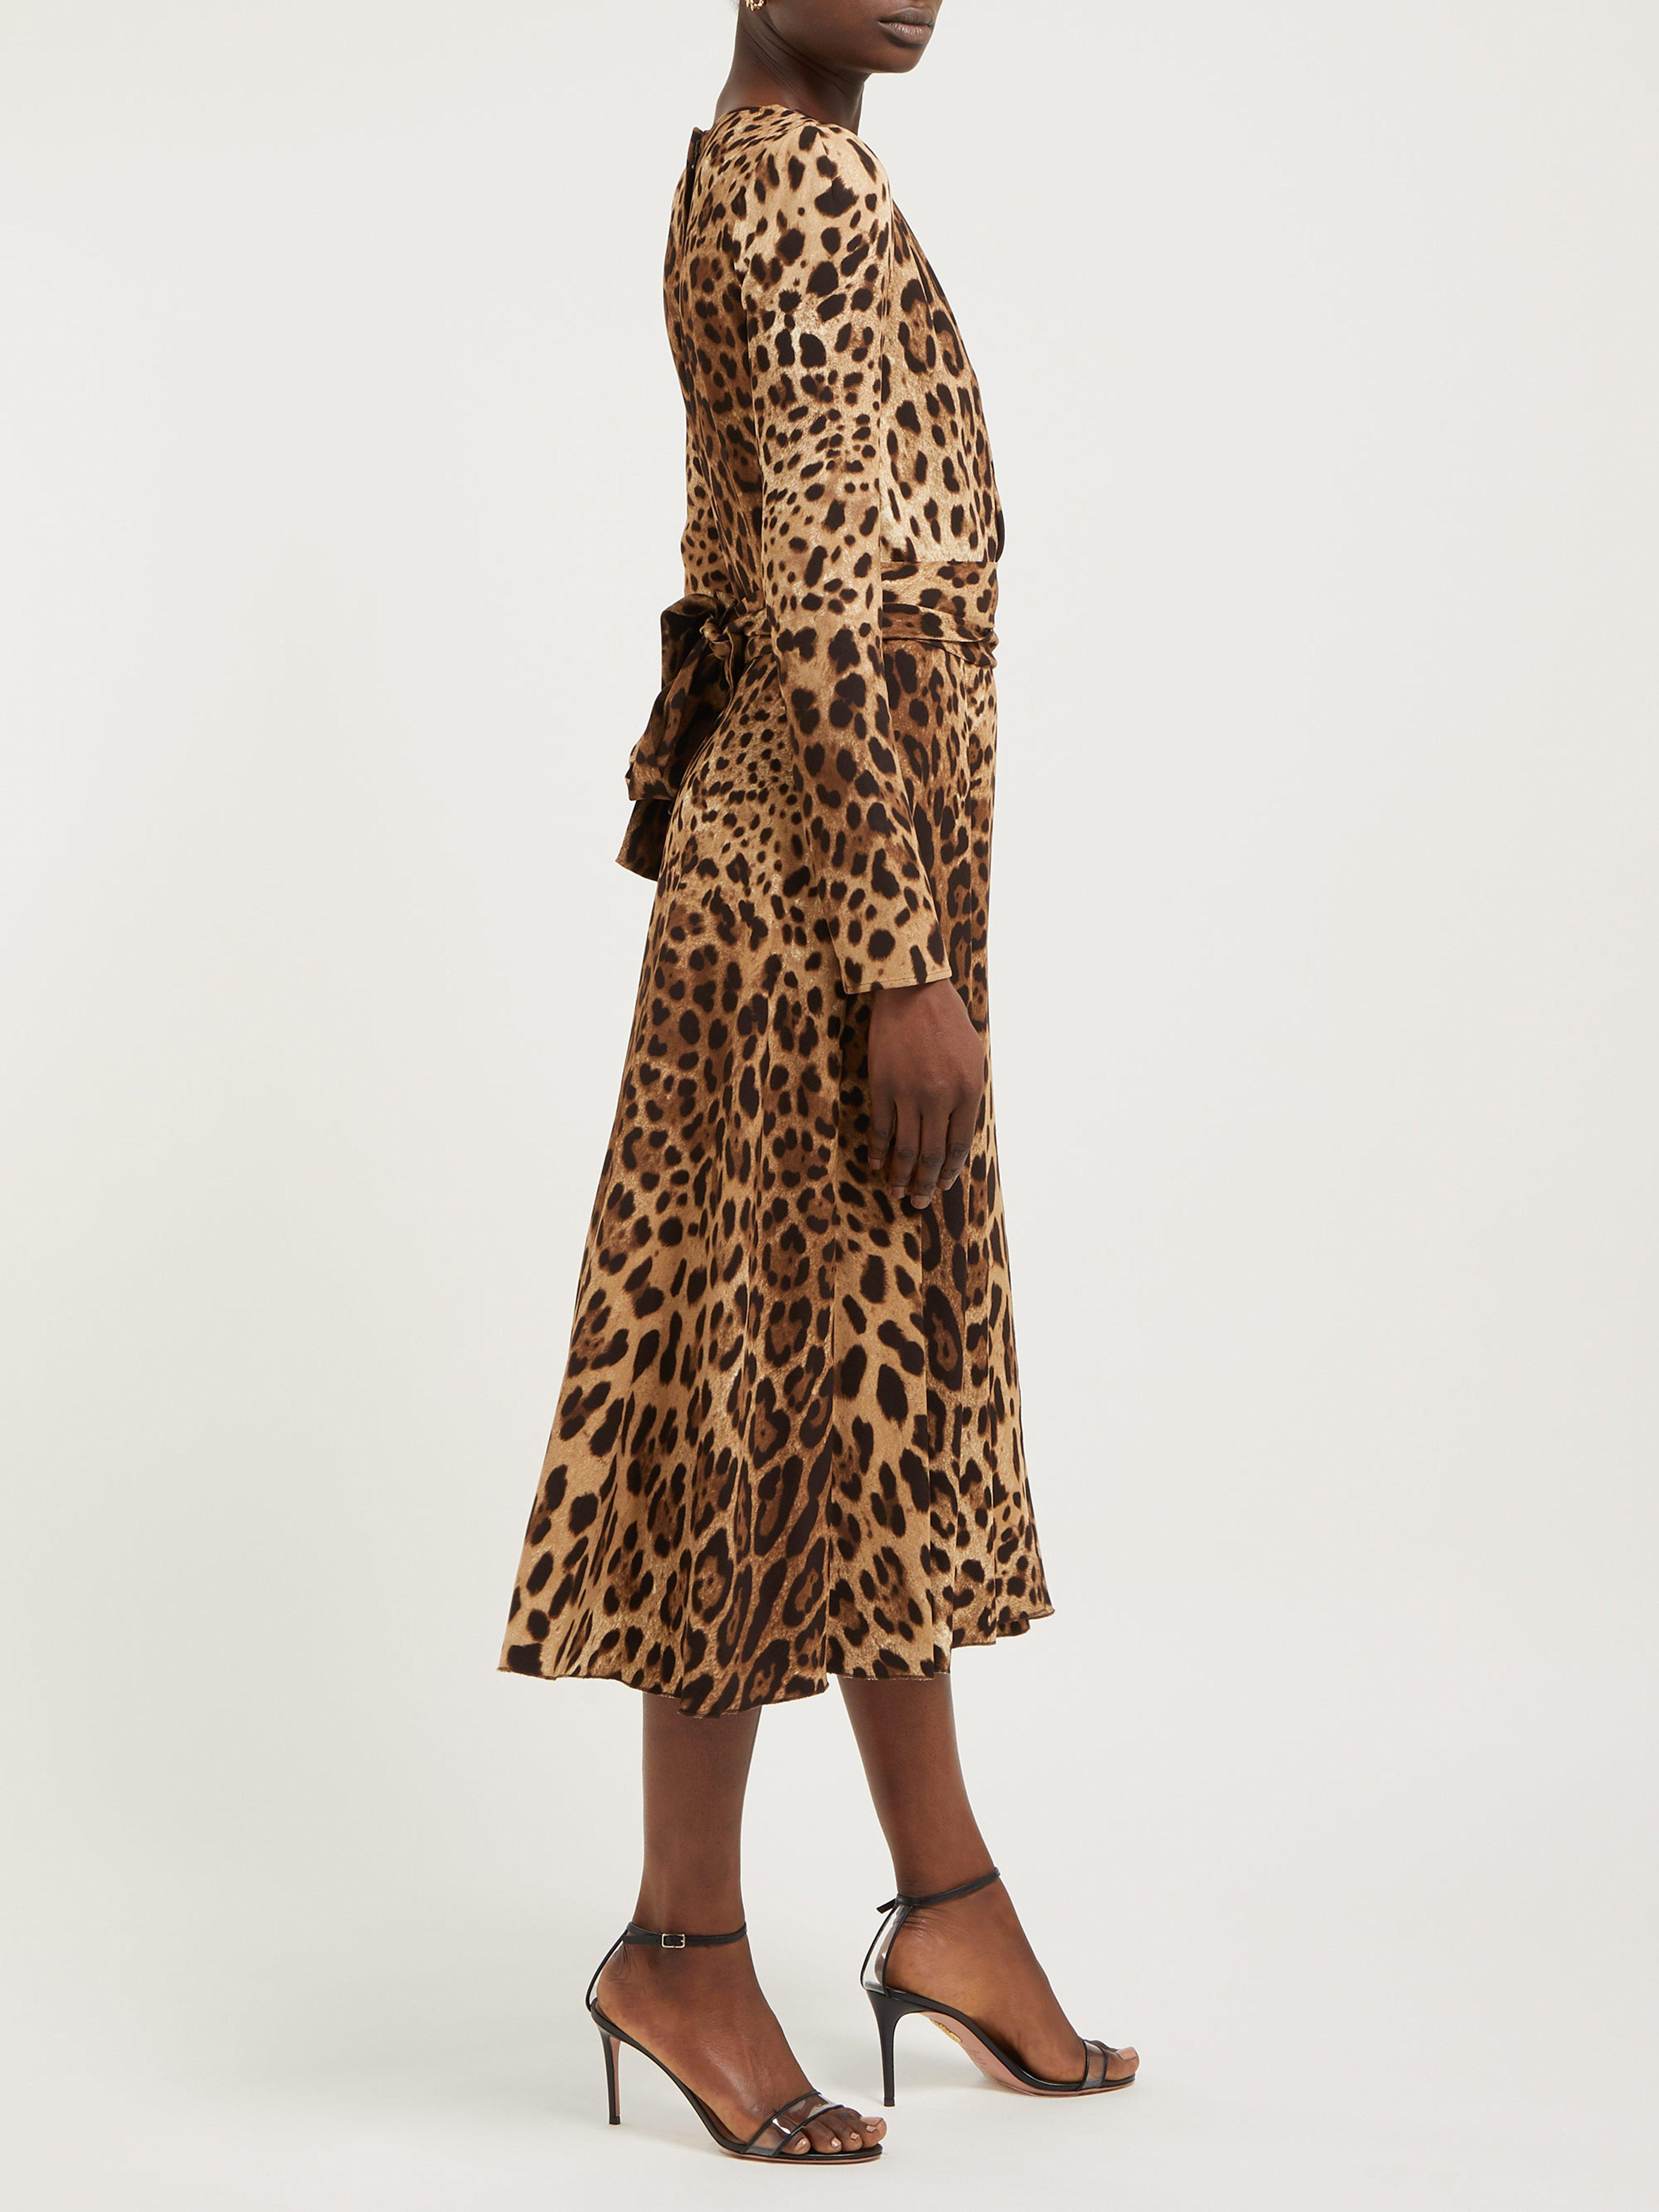 Dolce   Gabbana Leopard Print Belted Dress in Brown - Lyst b0069084e